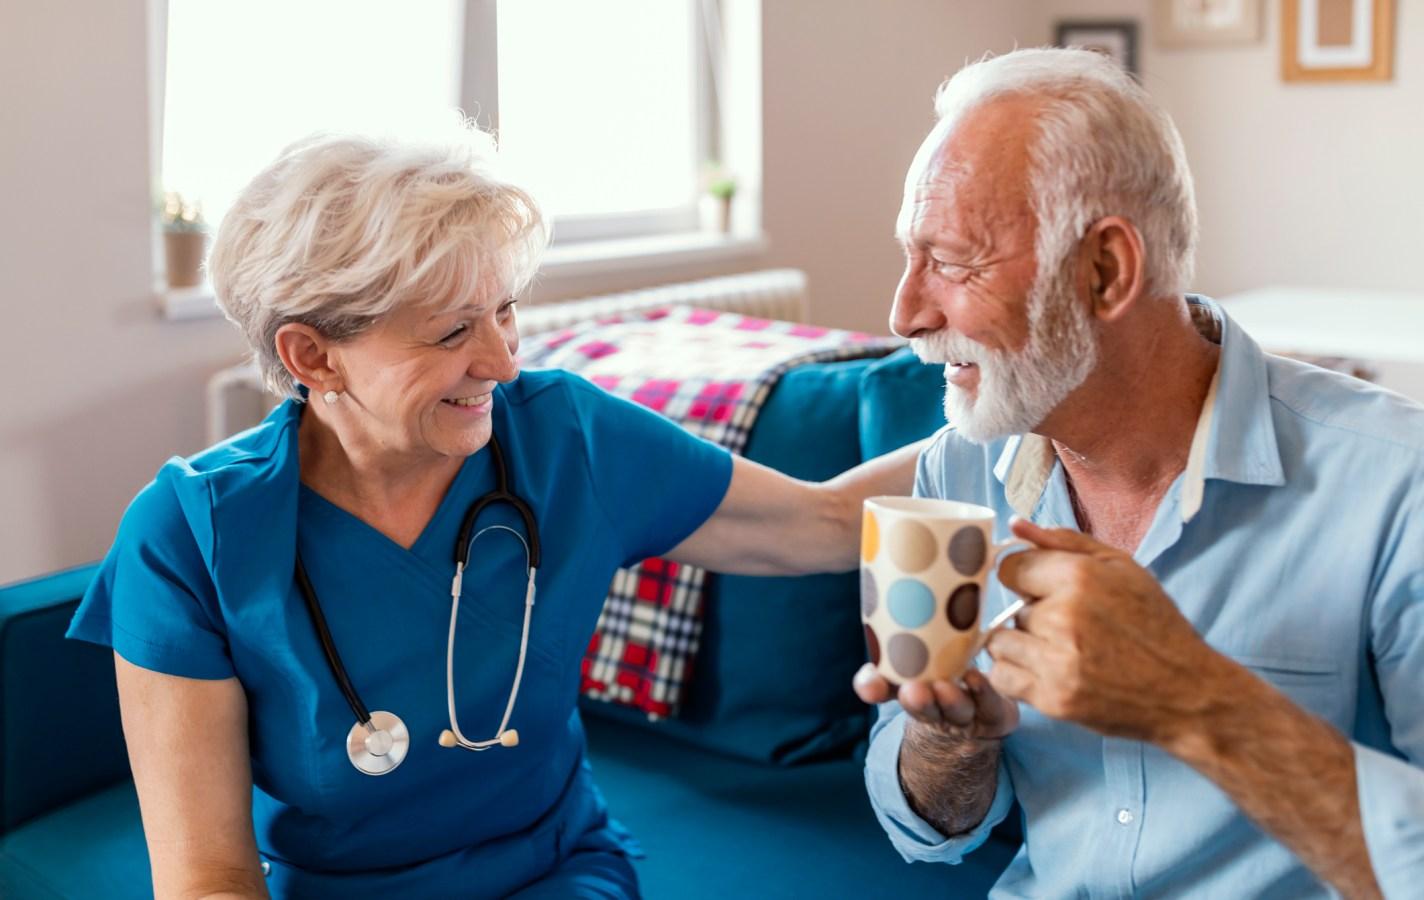 Female caregiver serving afternoon tea to patien